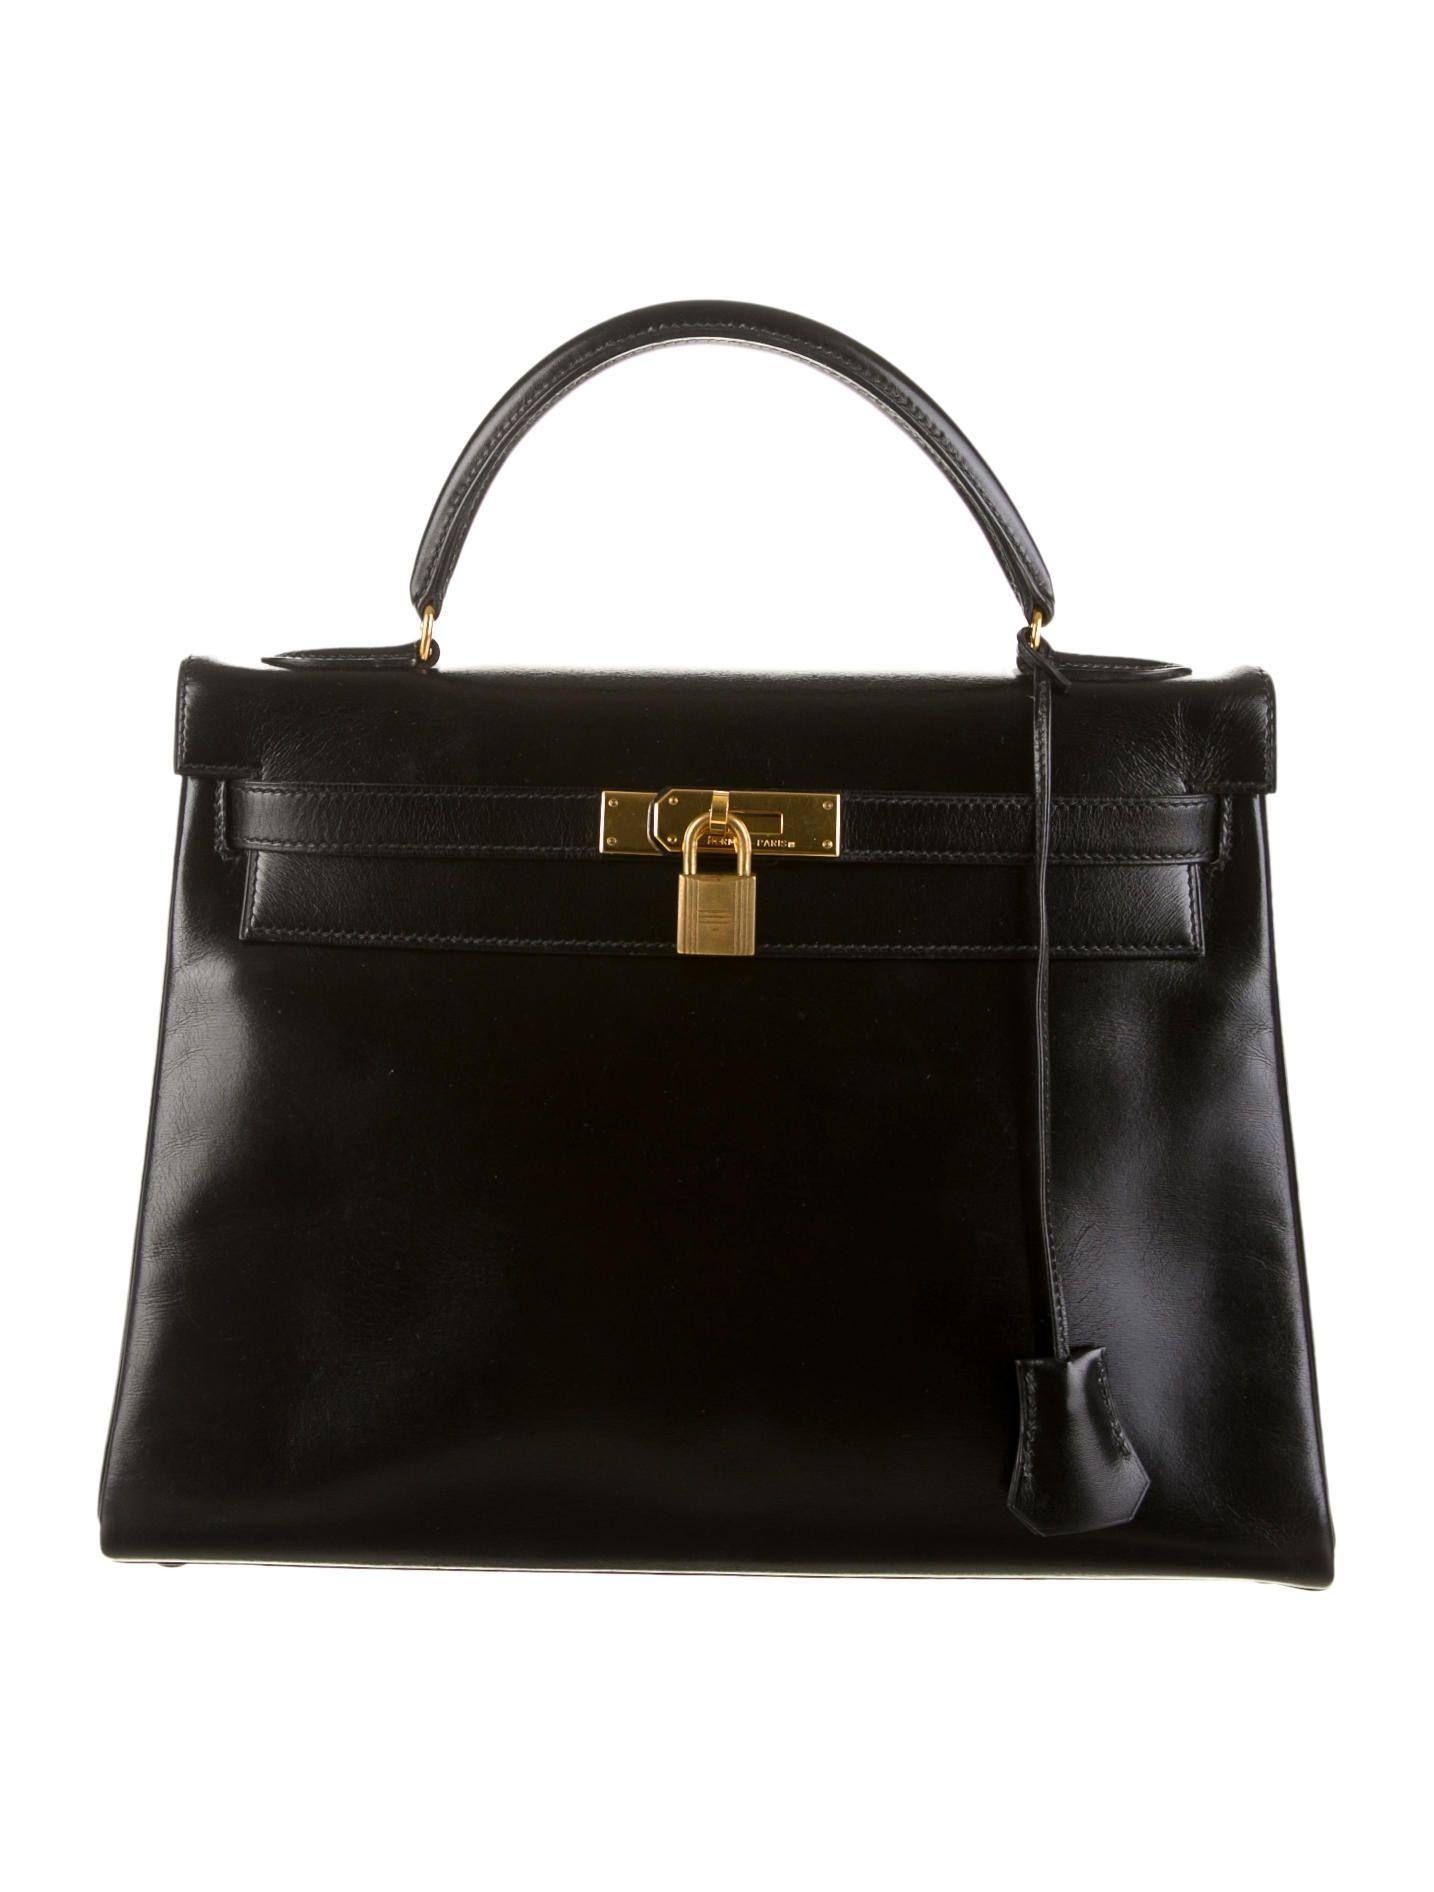 7185267e44979 ... coupon code for hermes kelly damenhandtaschen designer handtaschen  geldbörsen taschen 7000 fe7b6 54c38